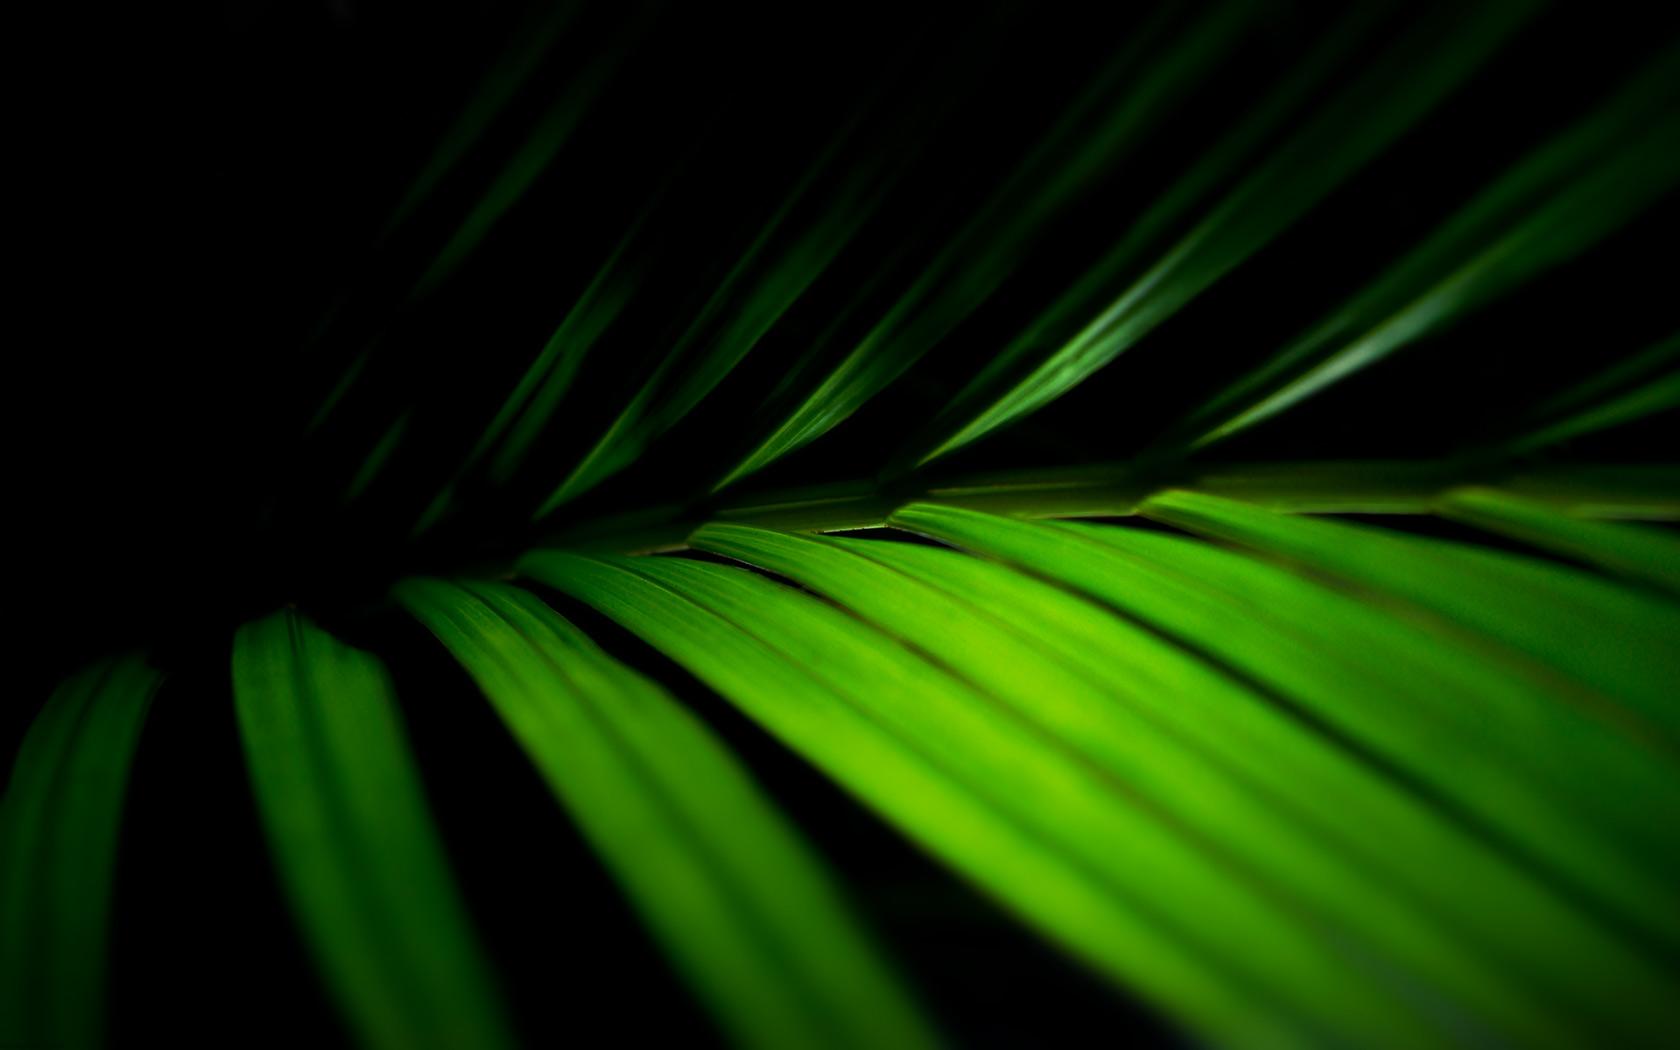 Palm Fronds Vista Desktop Background Pixel Popular Palm Branch Palm Sunday Background 1680x1050 Download Hd Wallpaper Wallpapertip